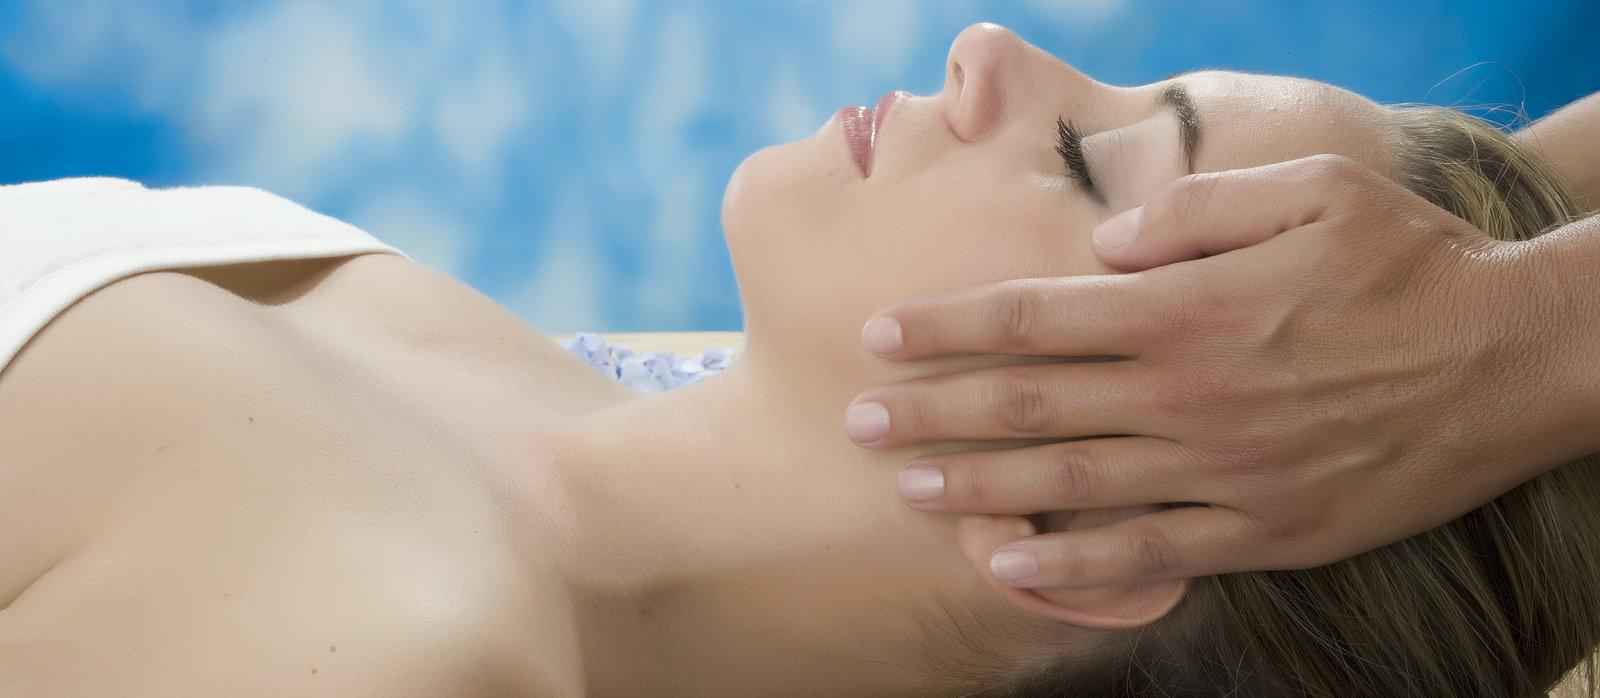 rsz-1massage-therapy-430369414.jpg